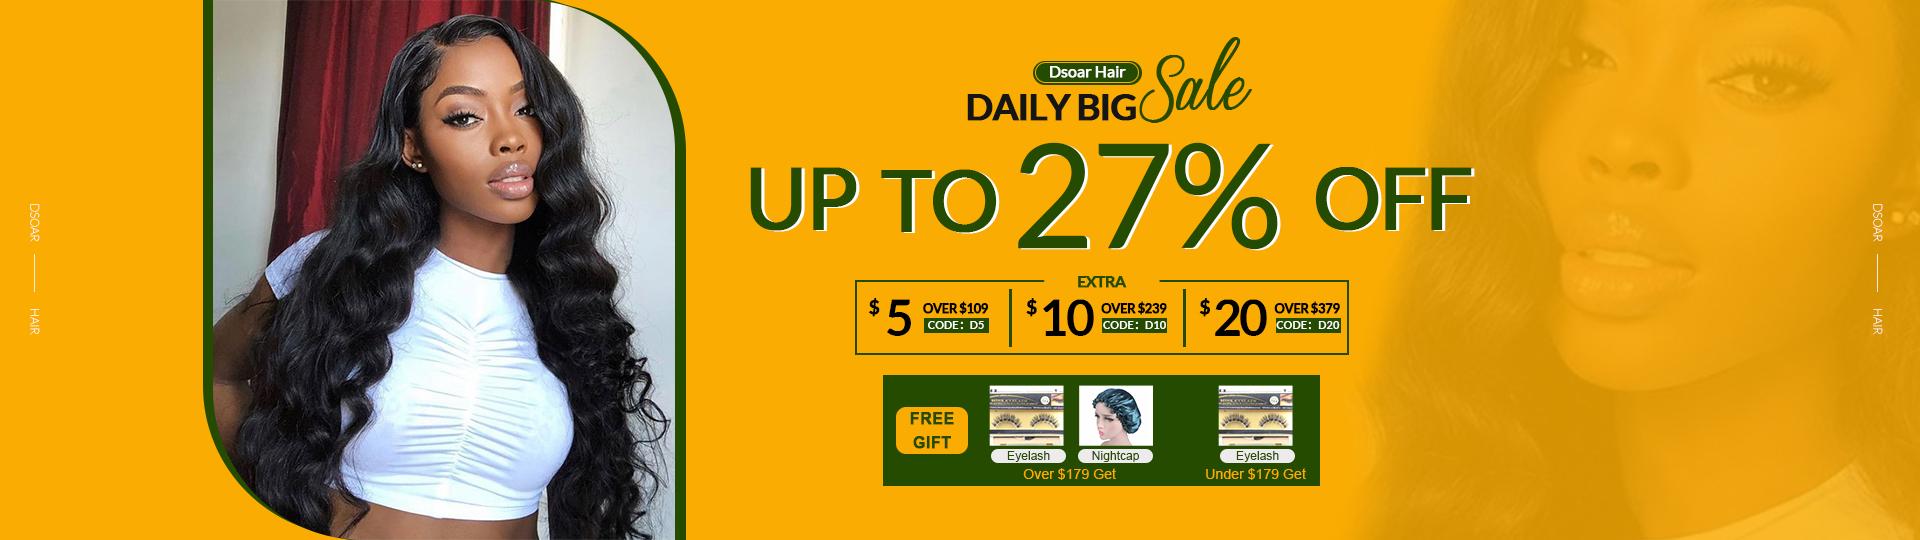 Dsoar Hair Daily Big Sale